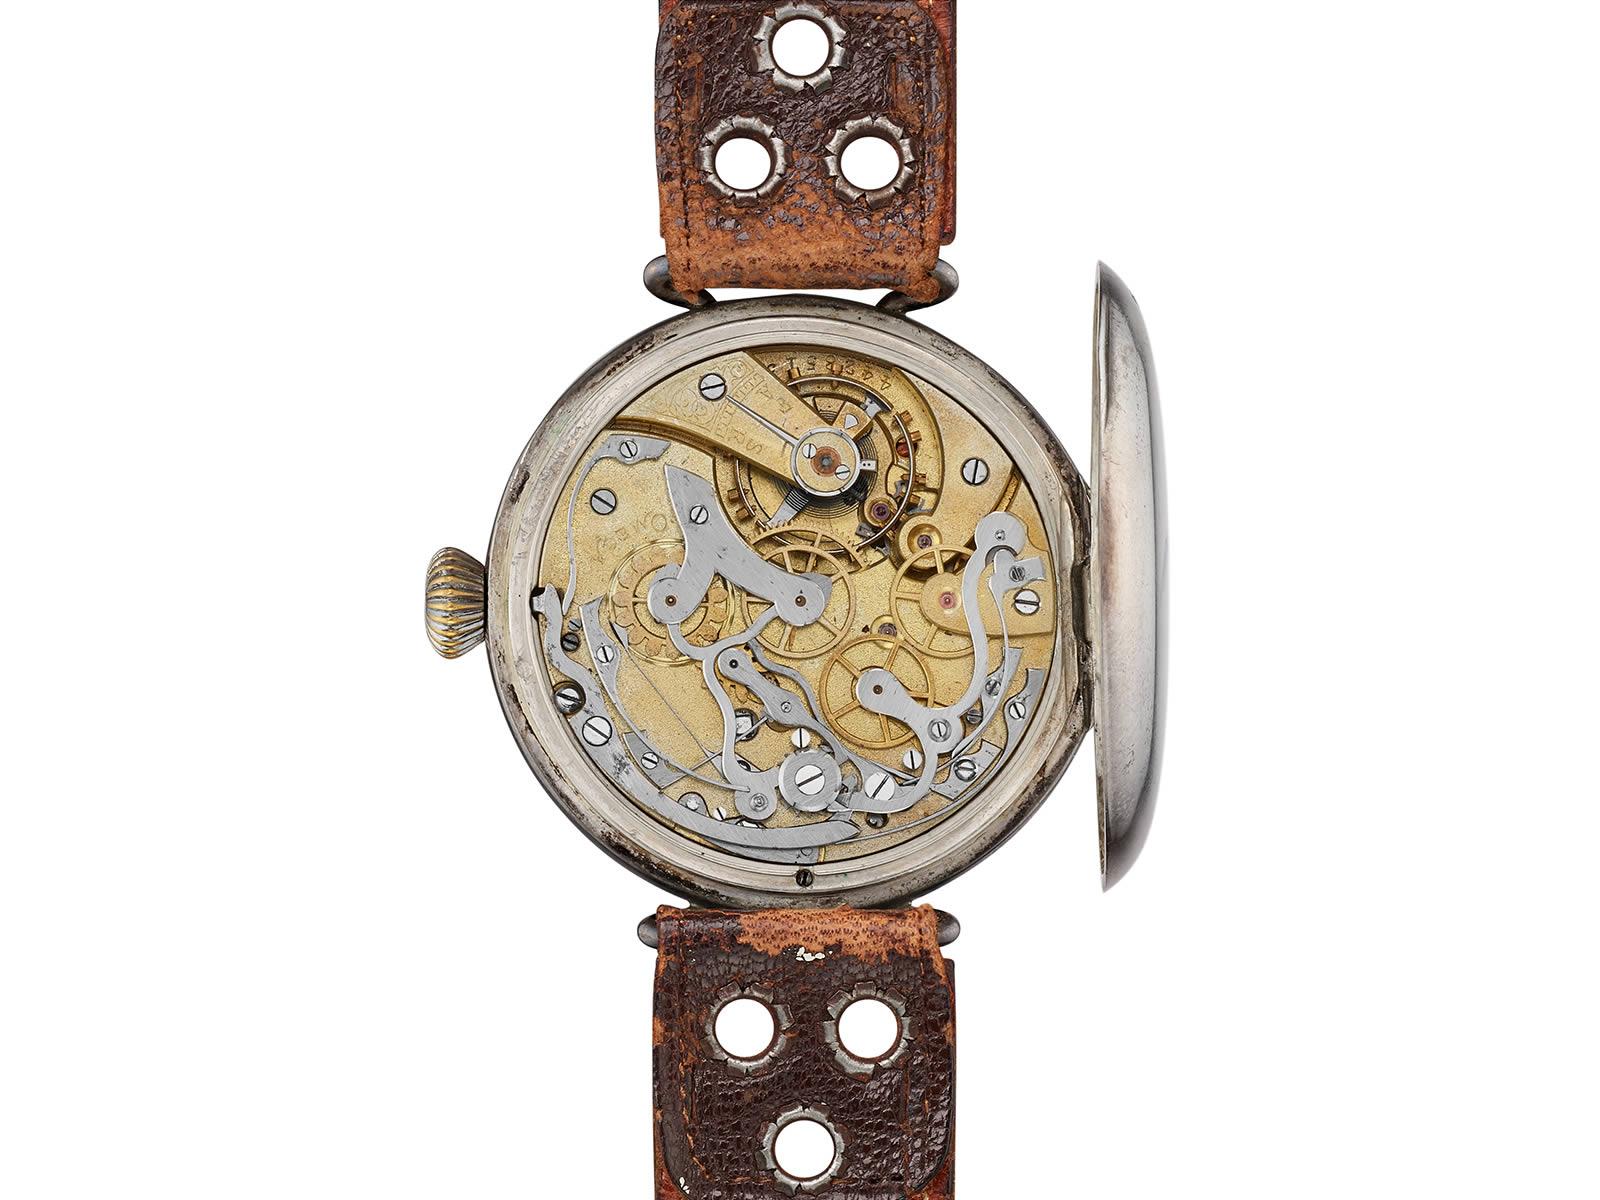 516-52-48-30-04-001-omega-18-chro-wrist-chronograph-limited-edition-11-.jpg